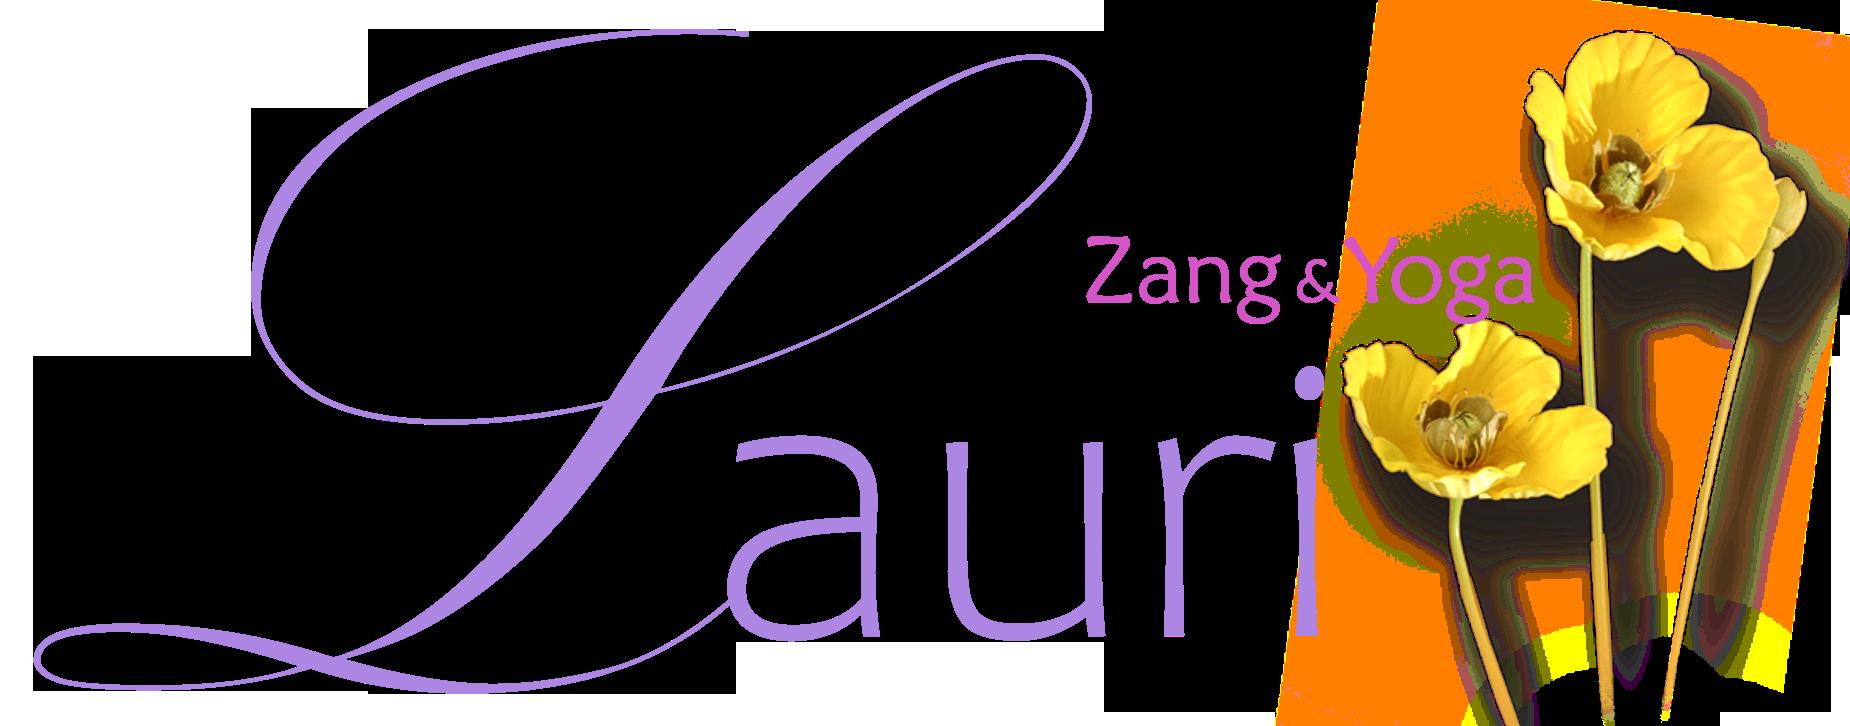 Logo Lauri Zang & Yoga